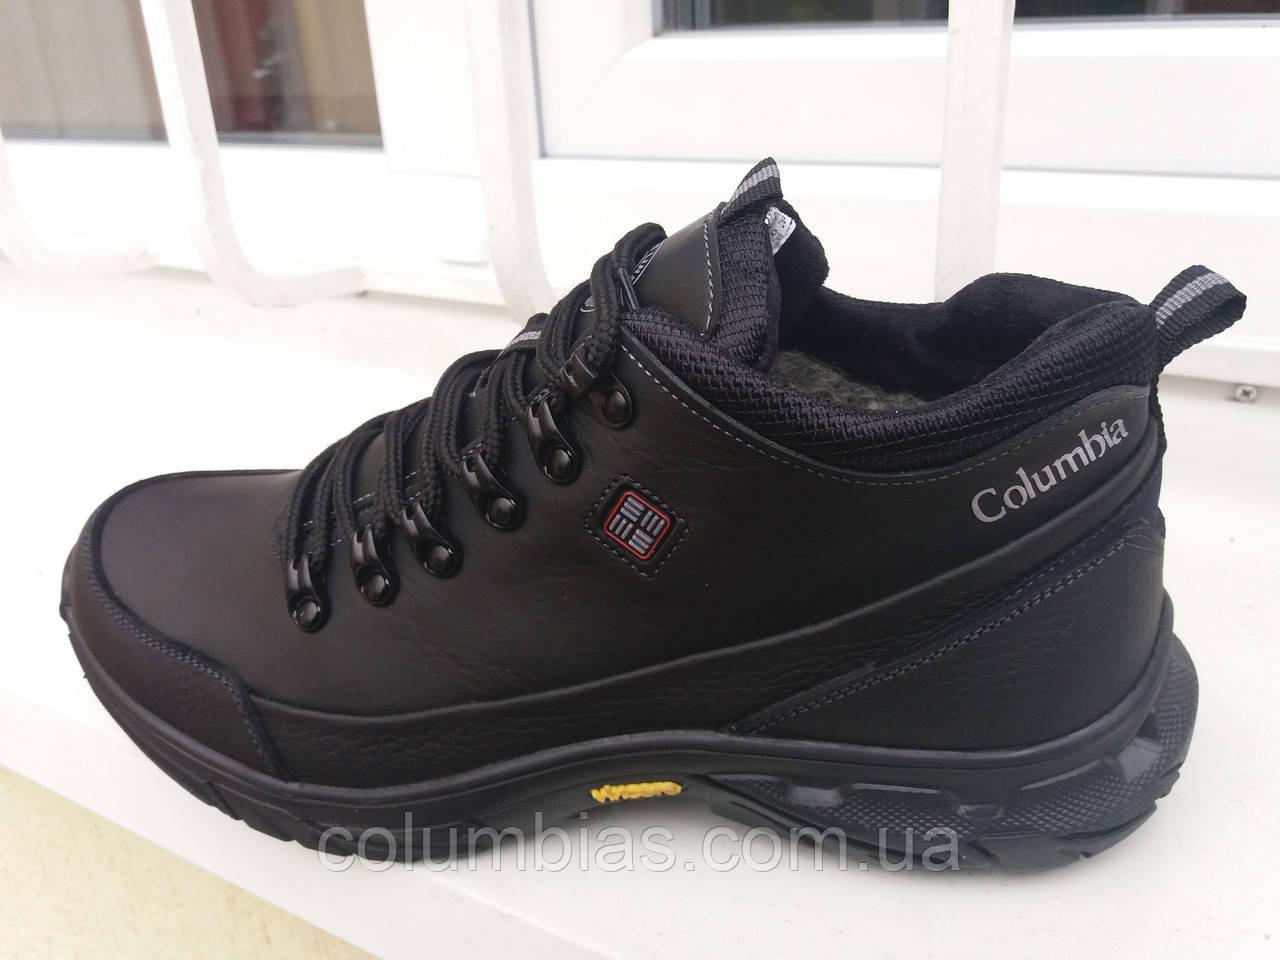 Мужская зимняя обувь colambia 3bafcbeacdb48